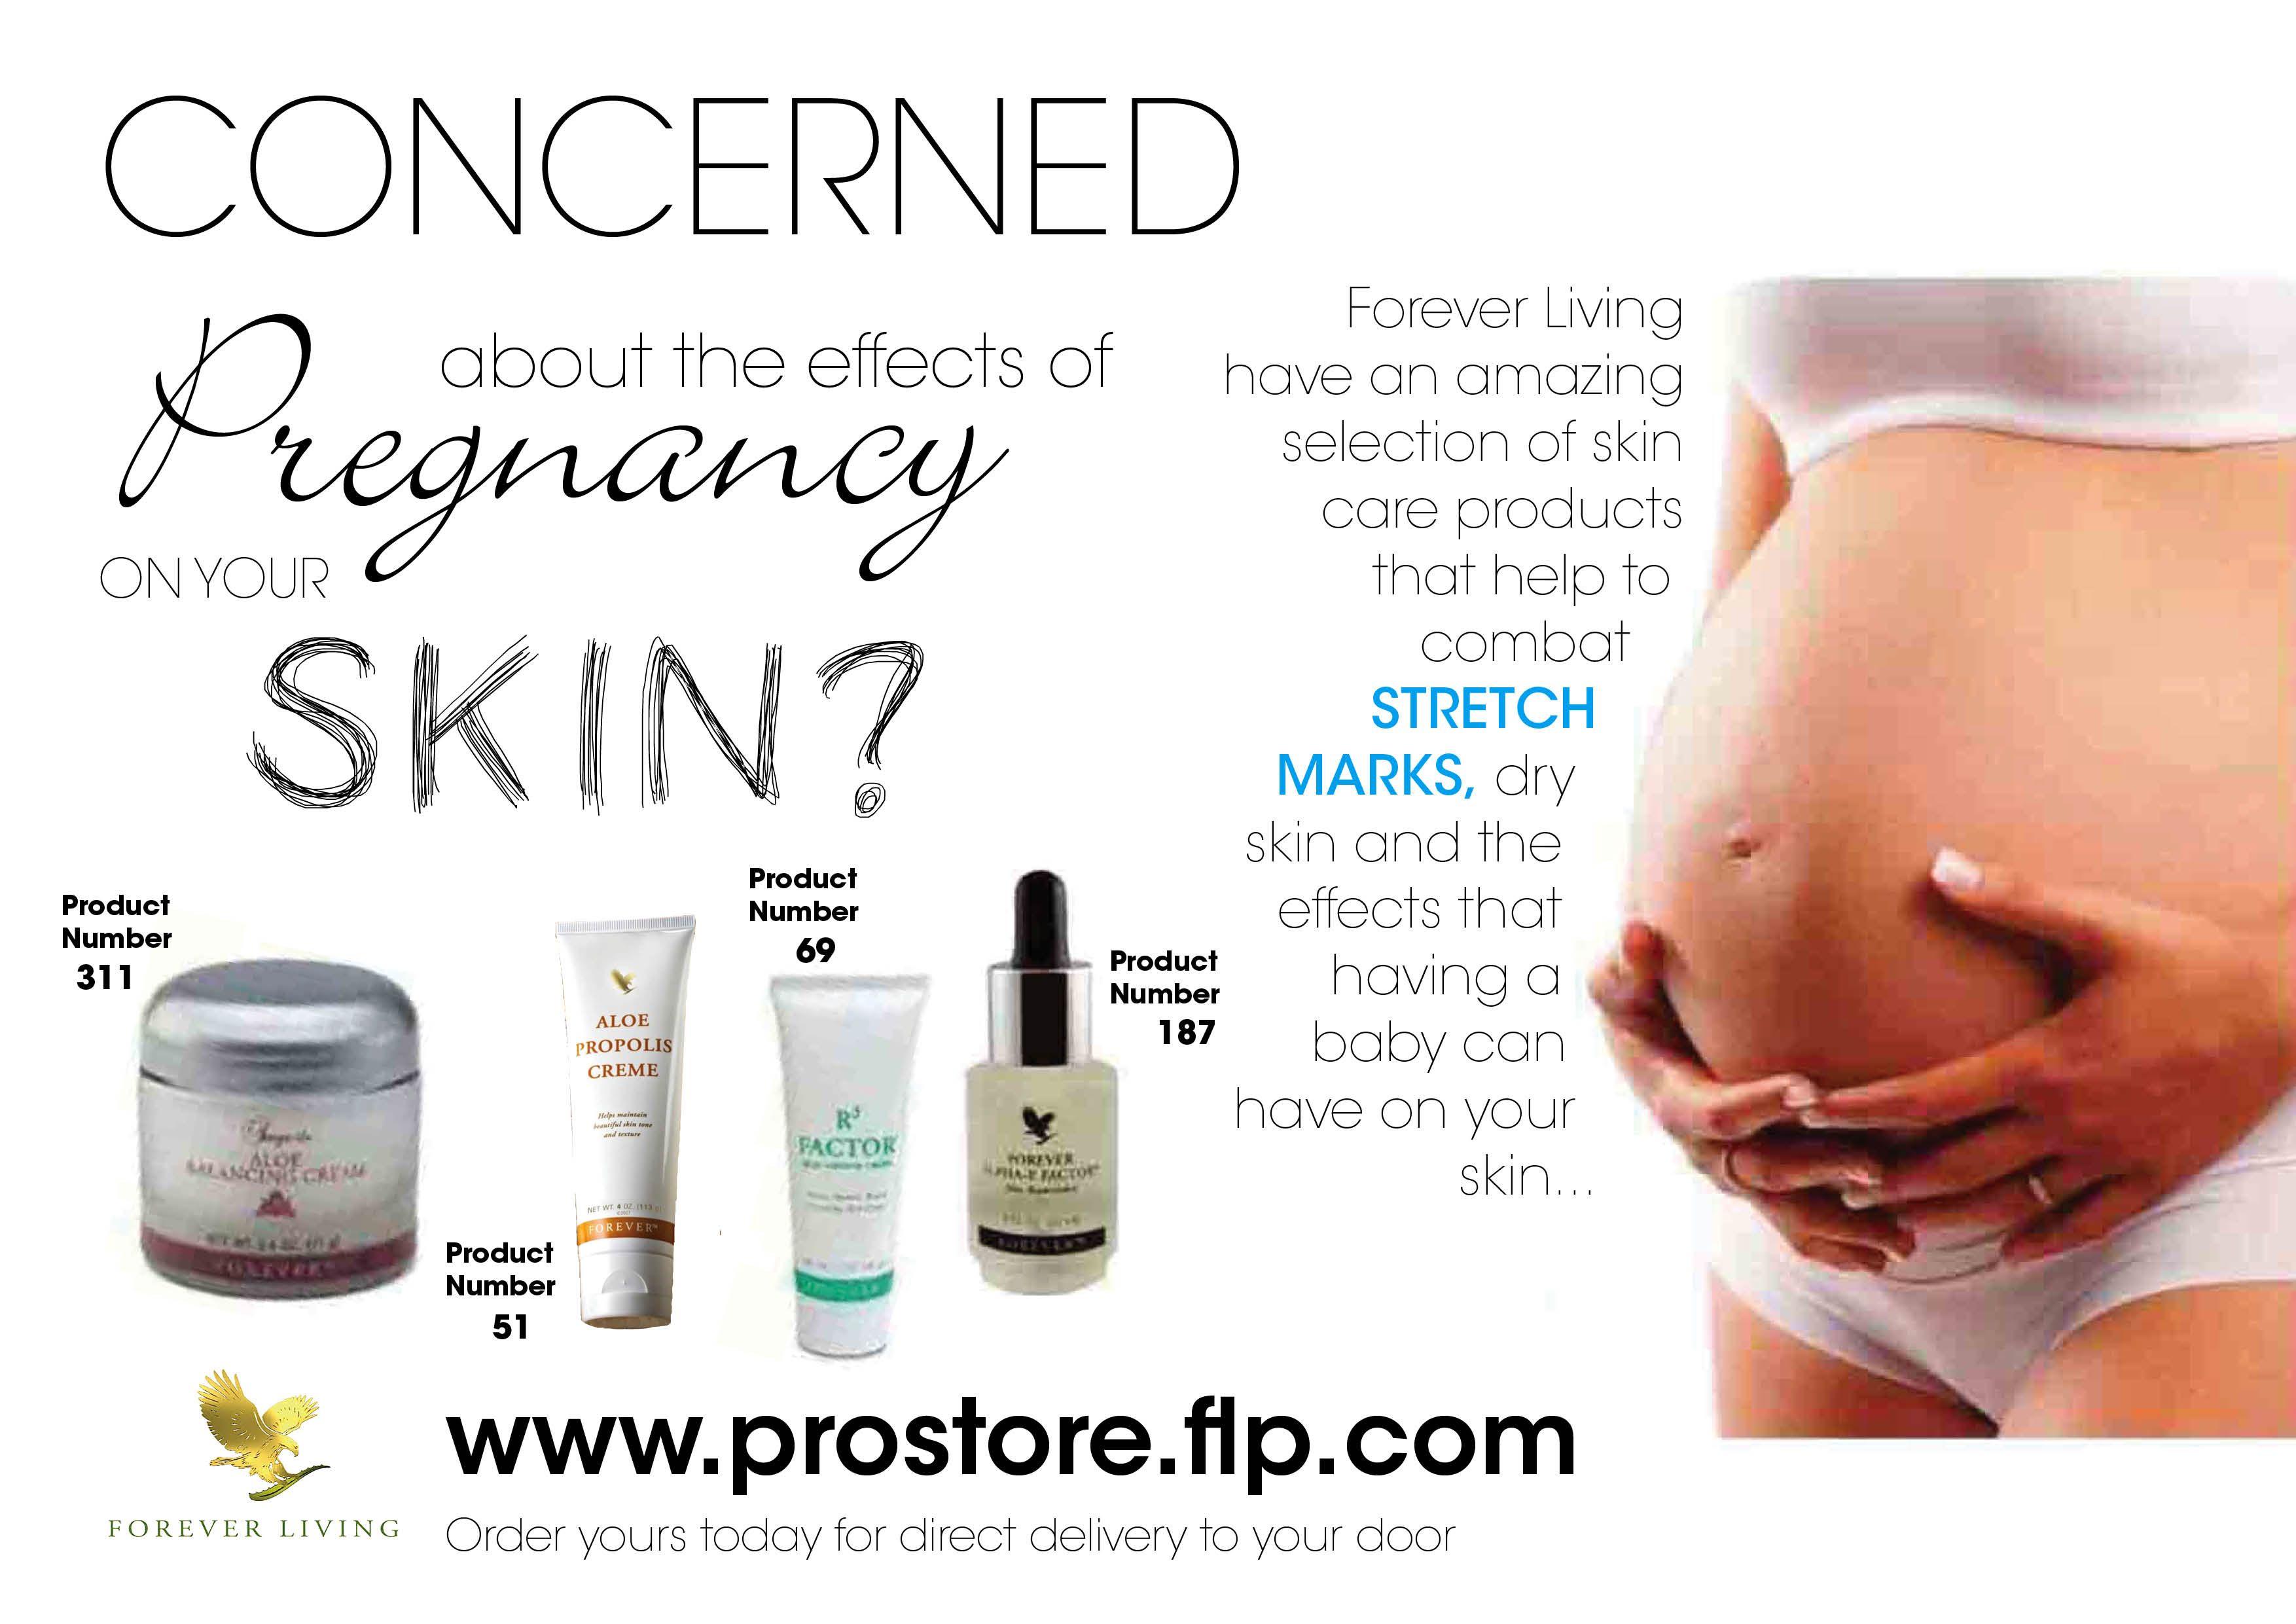 pregnancy, skin care, stretch marks